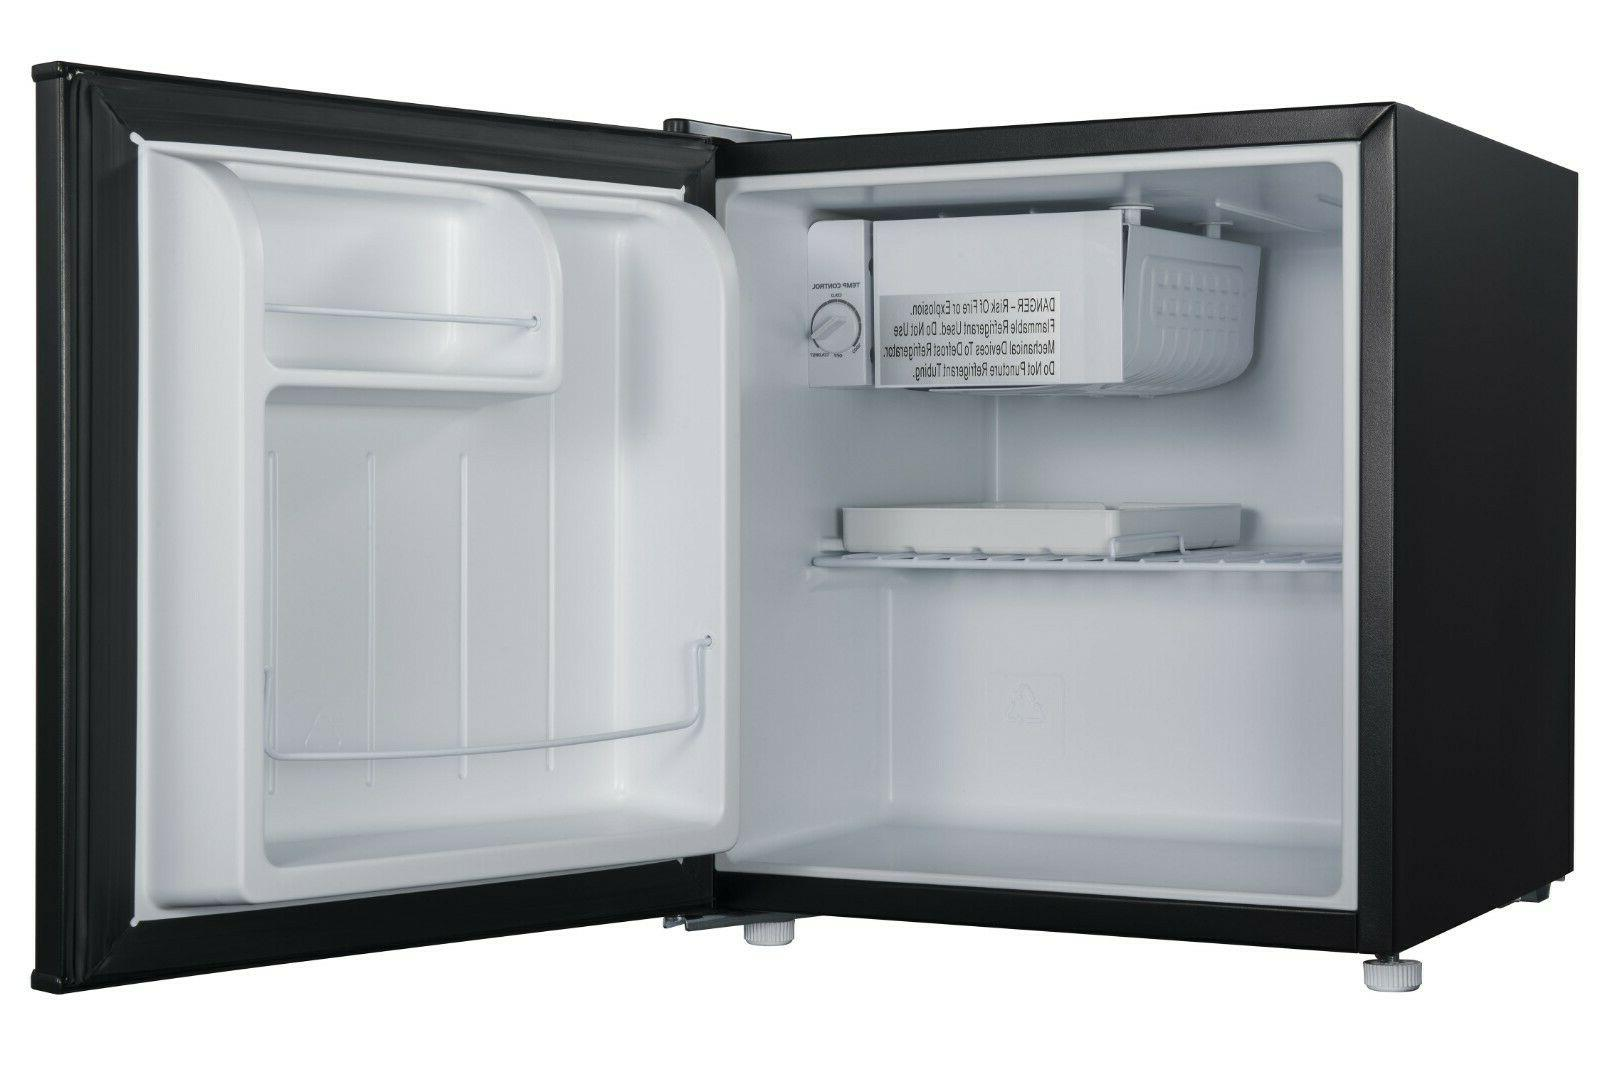 Single Mini Fridge compact shelf freeze cooler Black